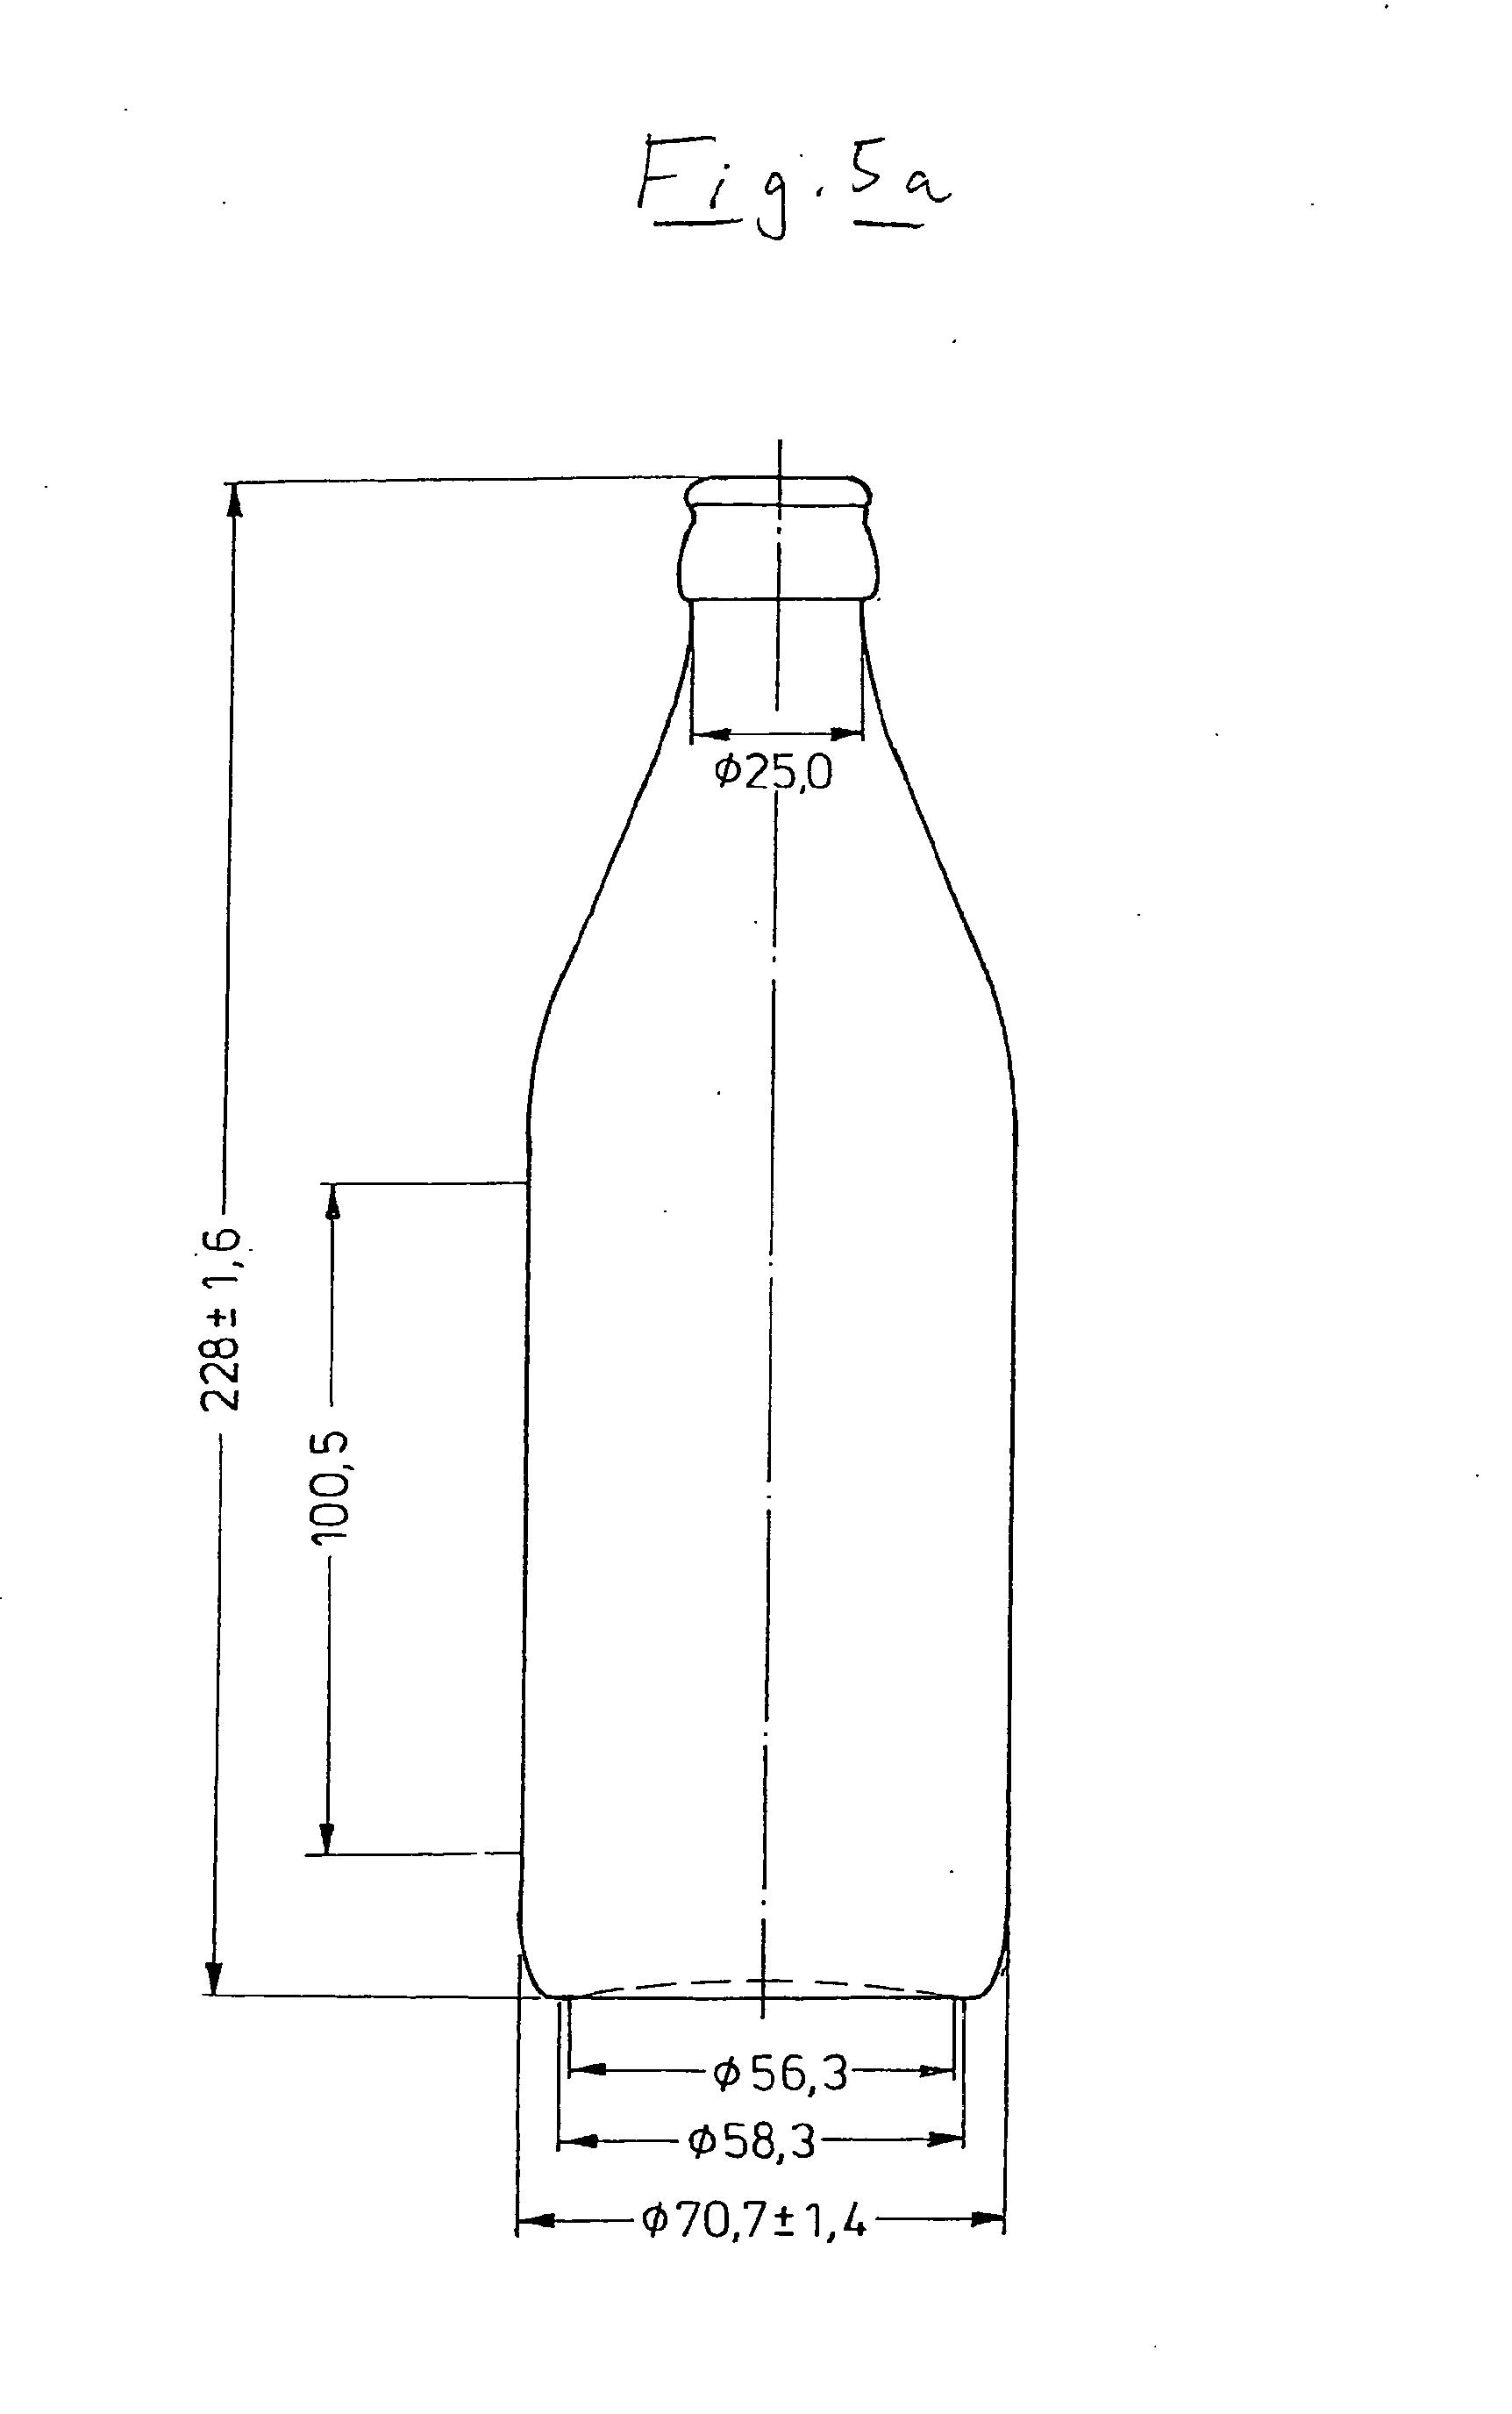 patent ep2530024a1 ladungstr ger google patentsuche. Black Bedroom Furniture Sets. Home Design Ideas